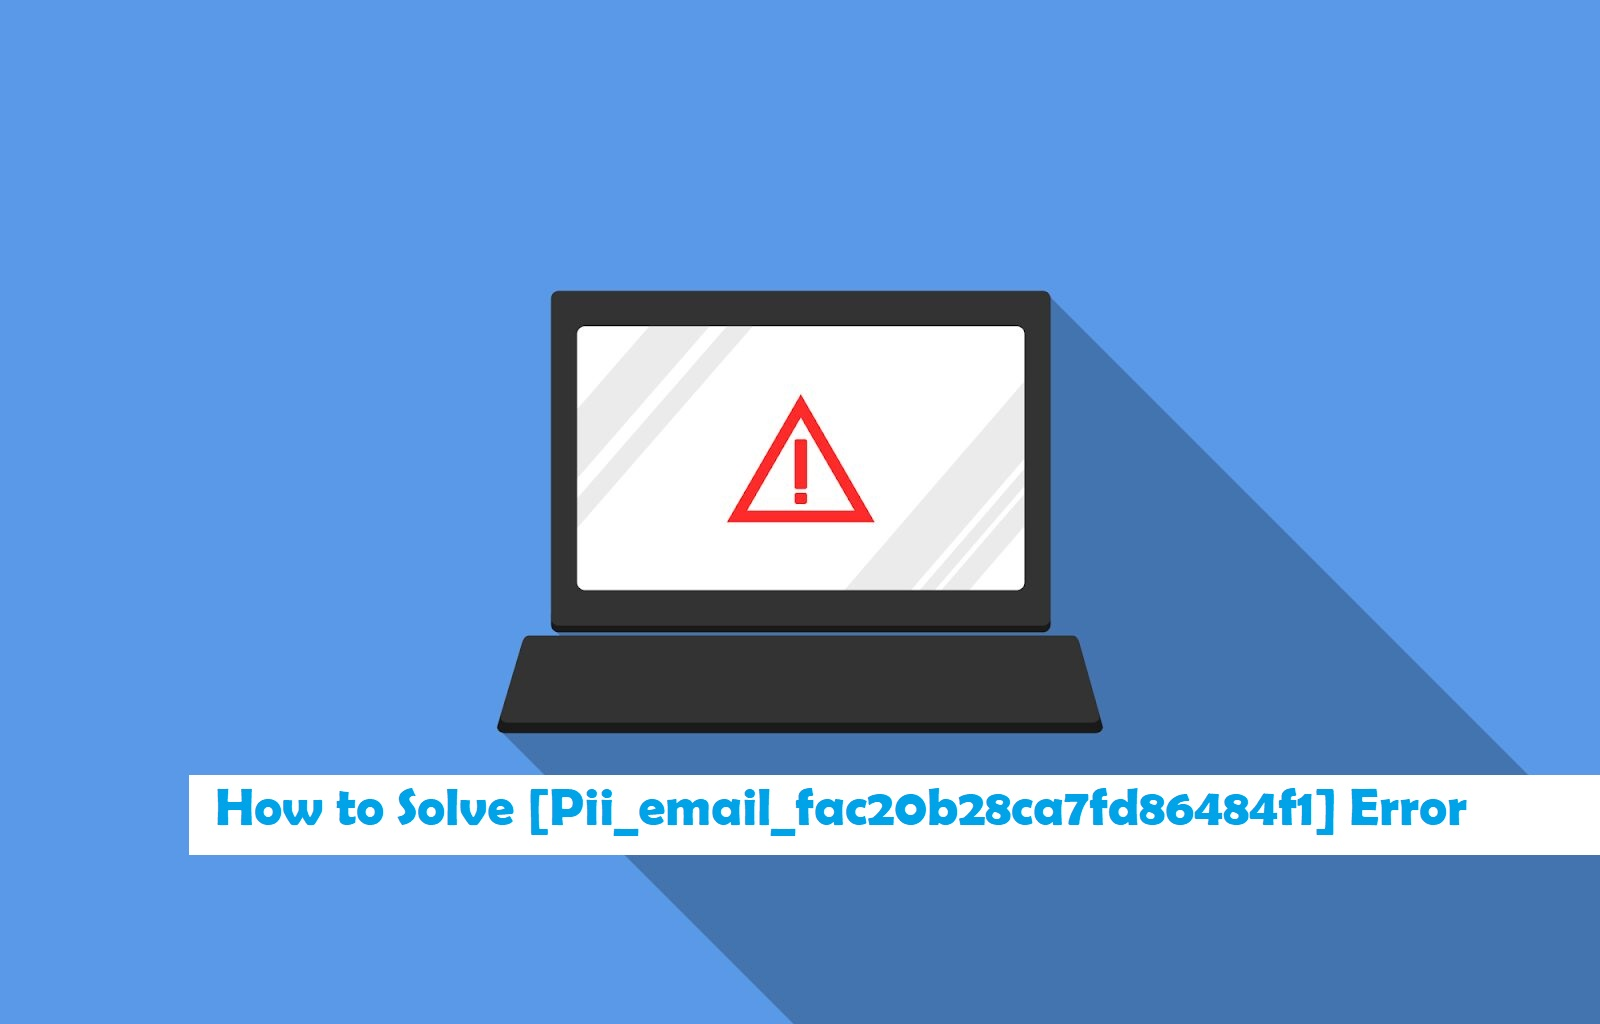 Solve [pii_email_fac20b28ca7fd86484f1] error